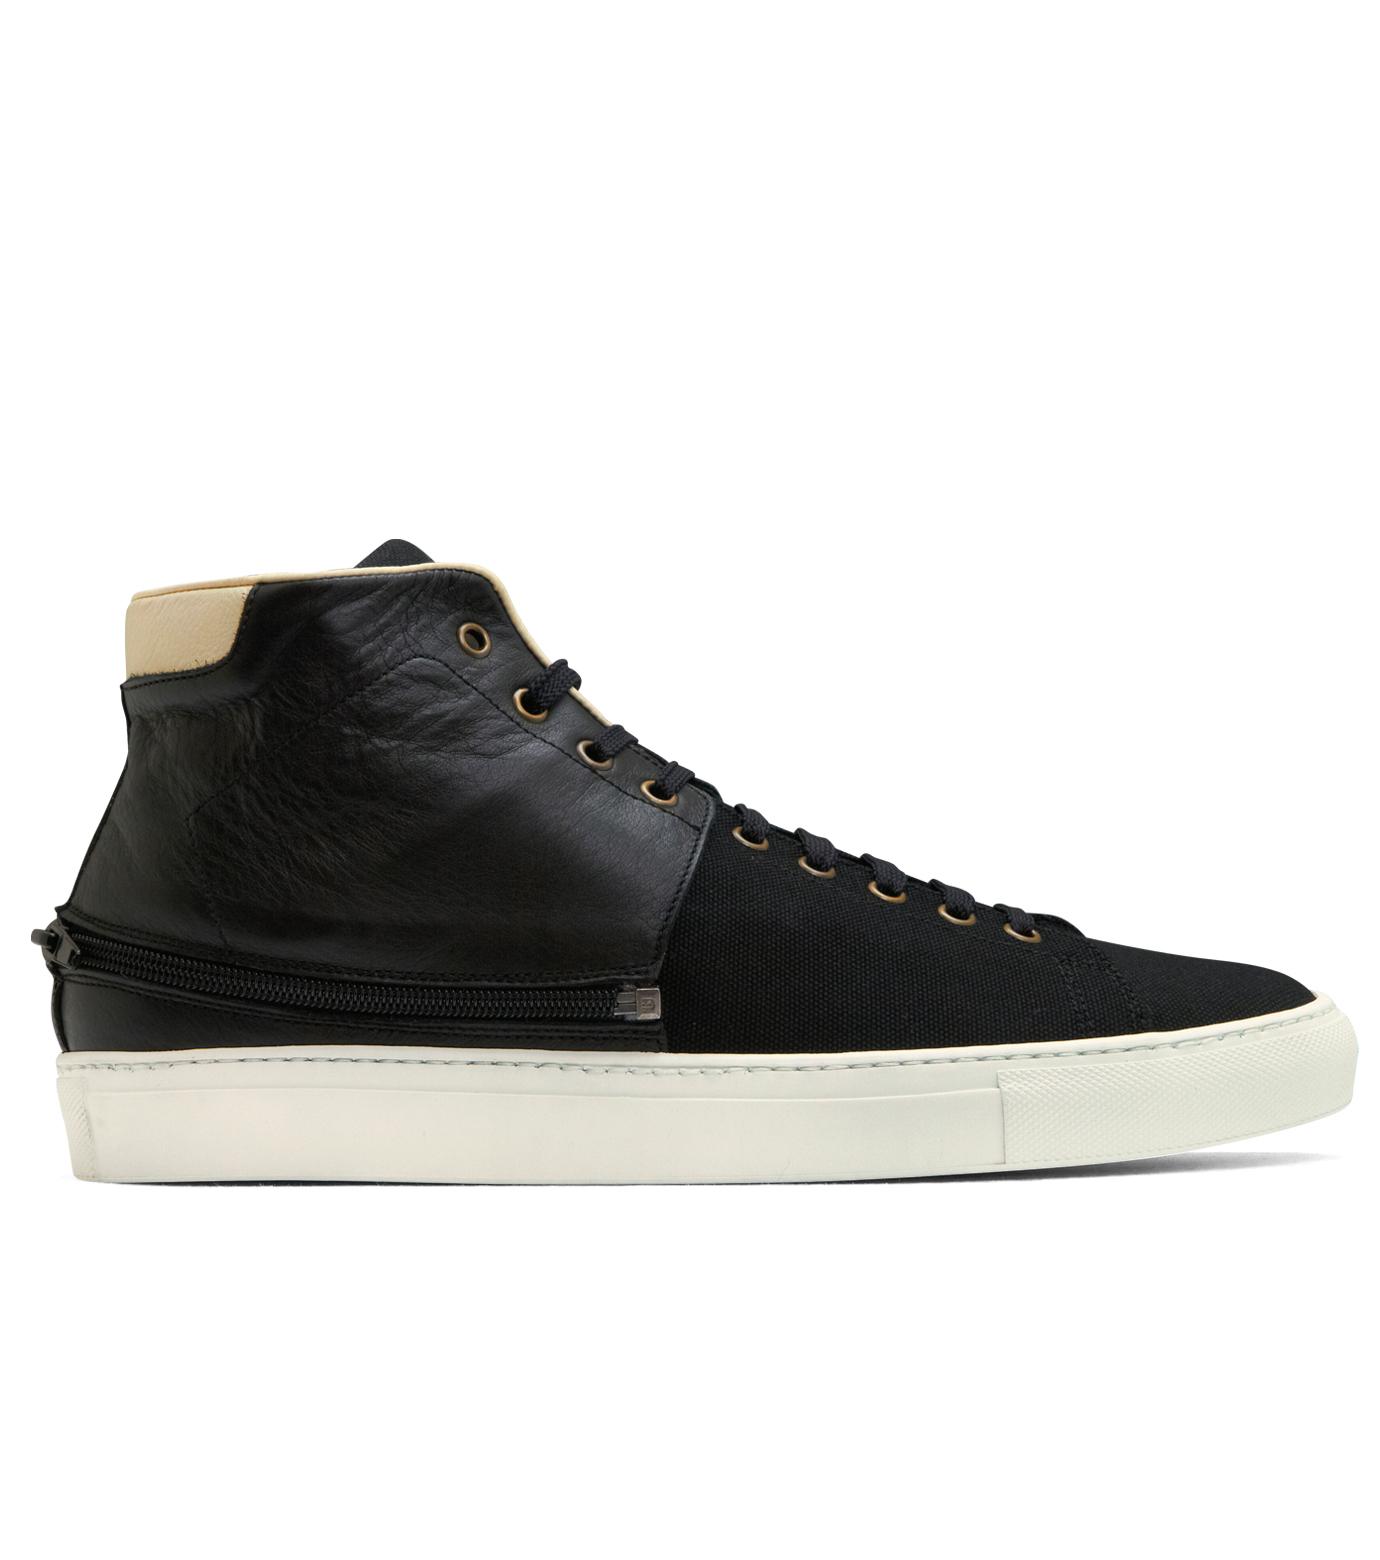 Trussardi(トラサルディ)のSeparate Sneaker-BLACK-1RS721-13 拡大詳細画像1